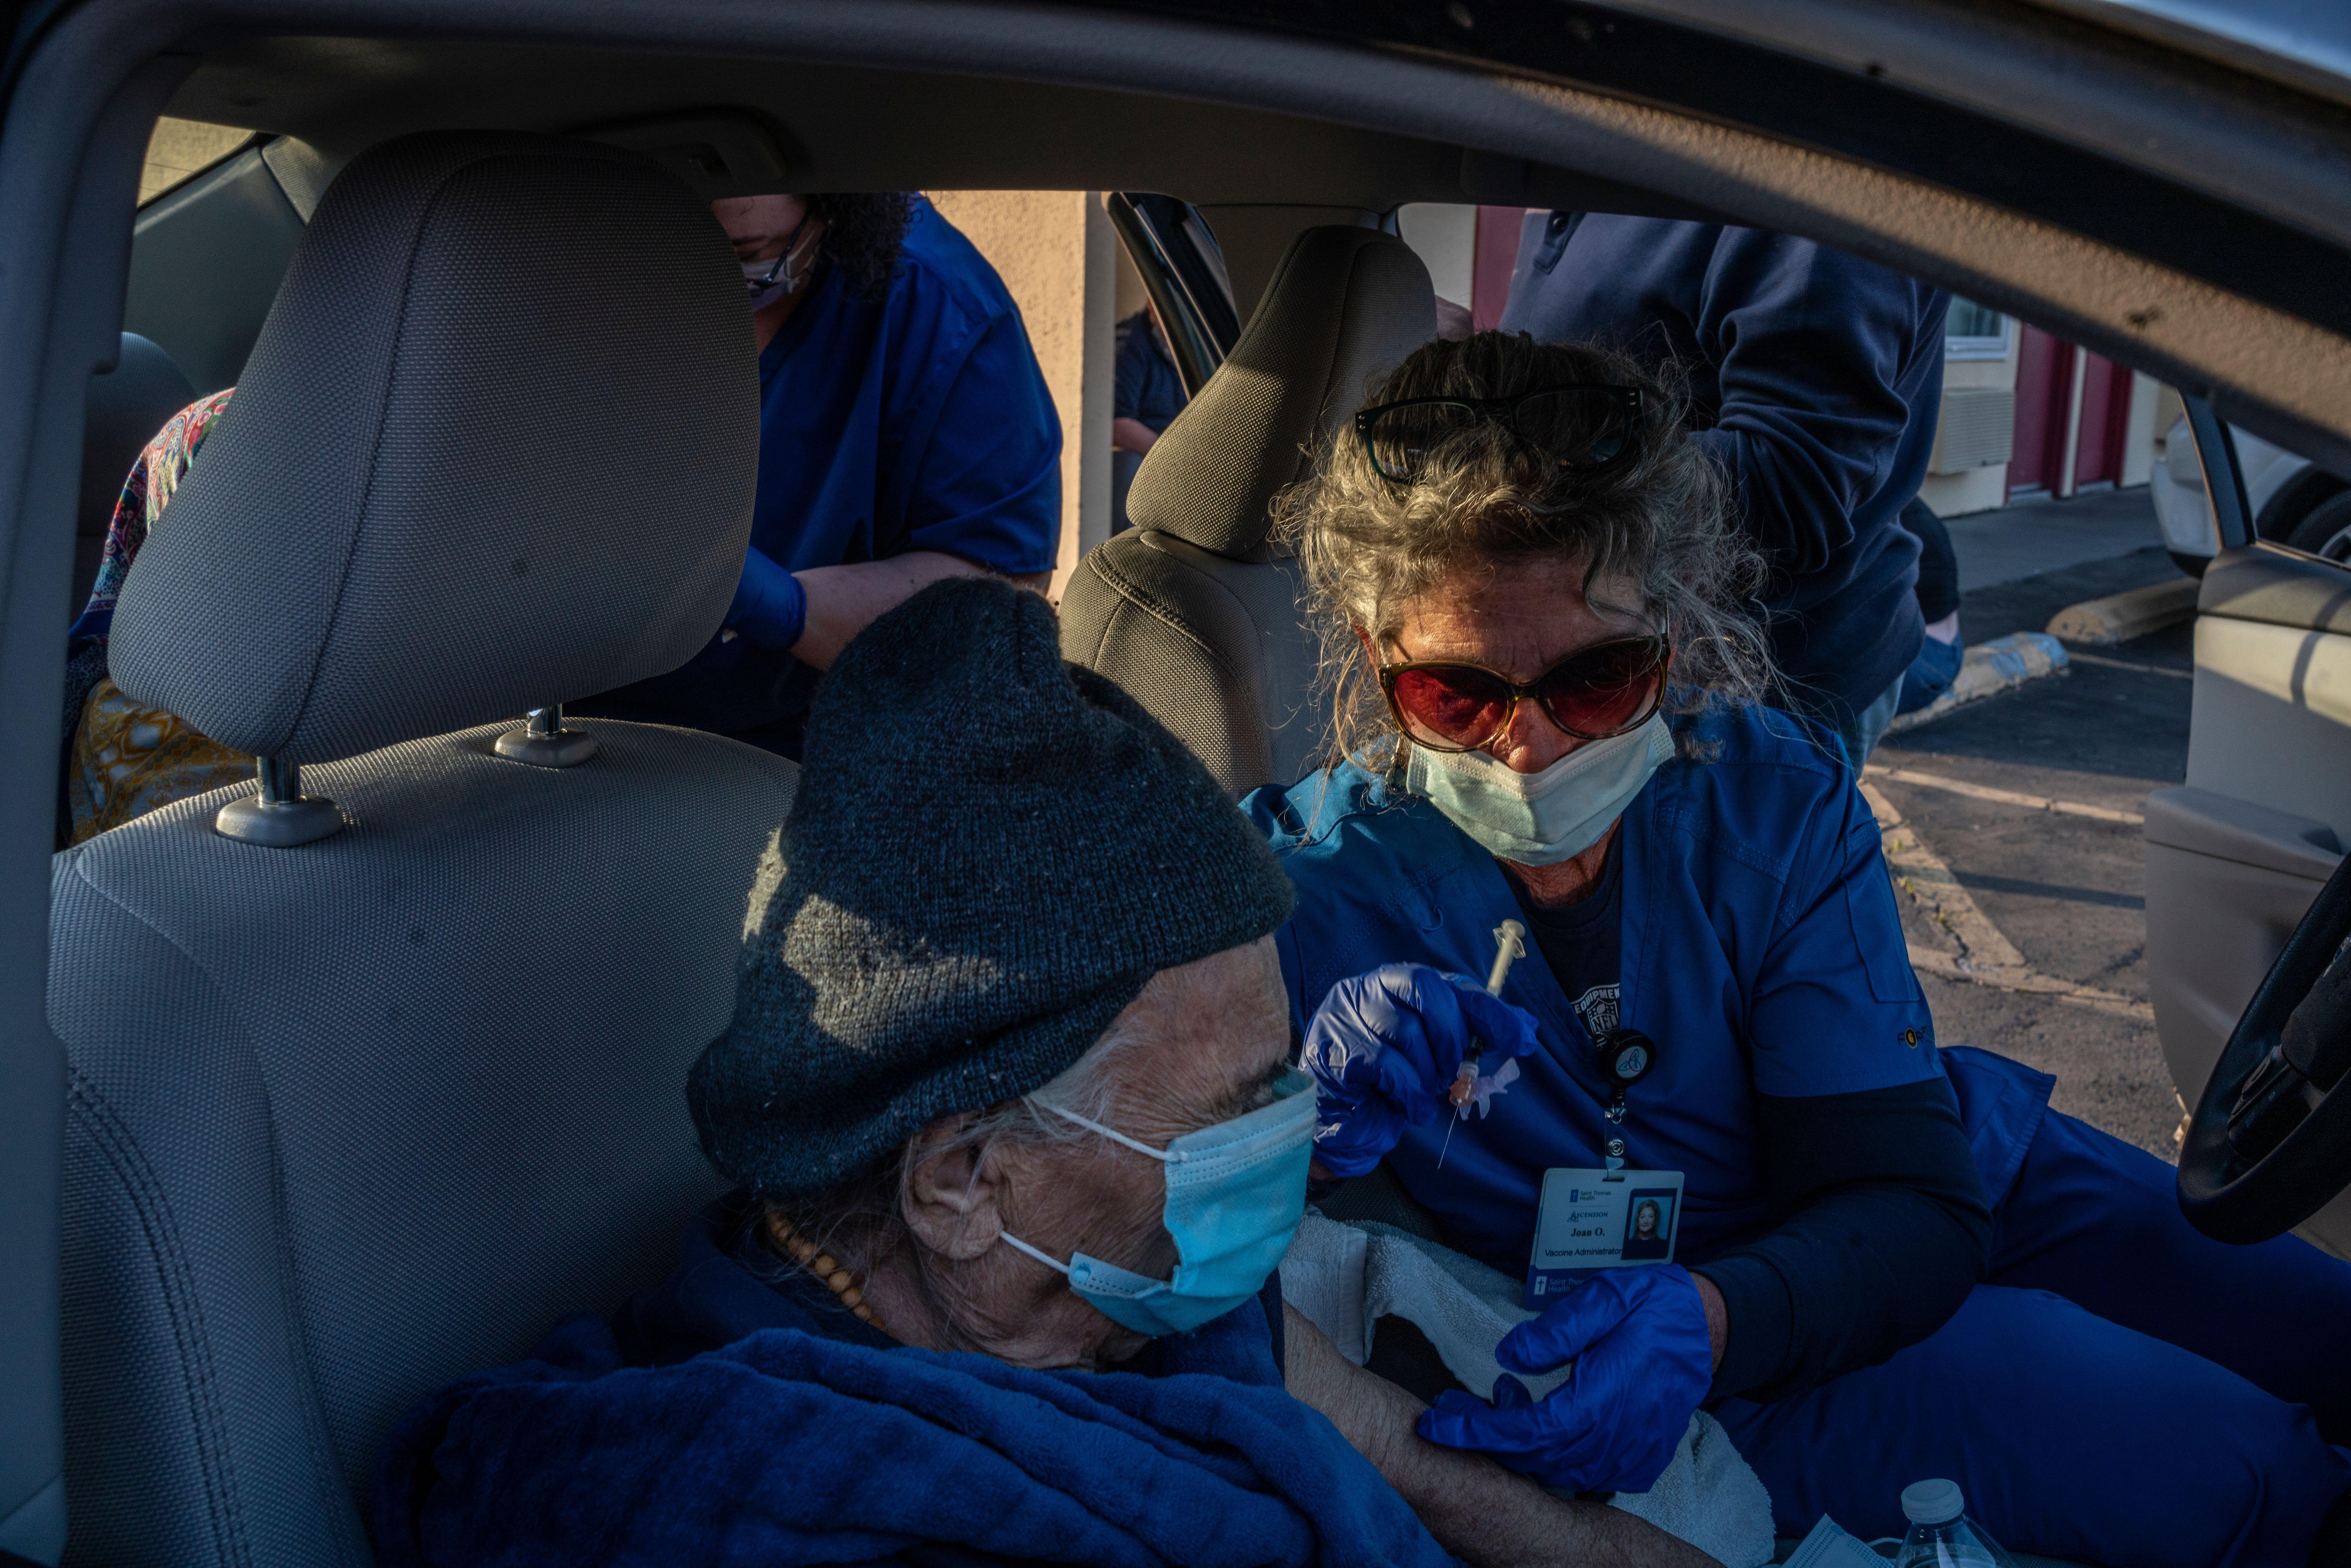 Saggankunver Chudasami 97, get a Johnson and Johnson vaccine in her son's car at a South Nashville Rodeway Inn. (Photo: John Partipilo)